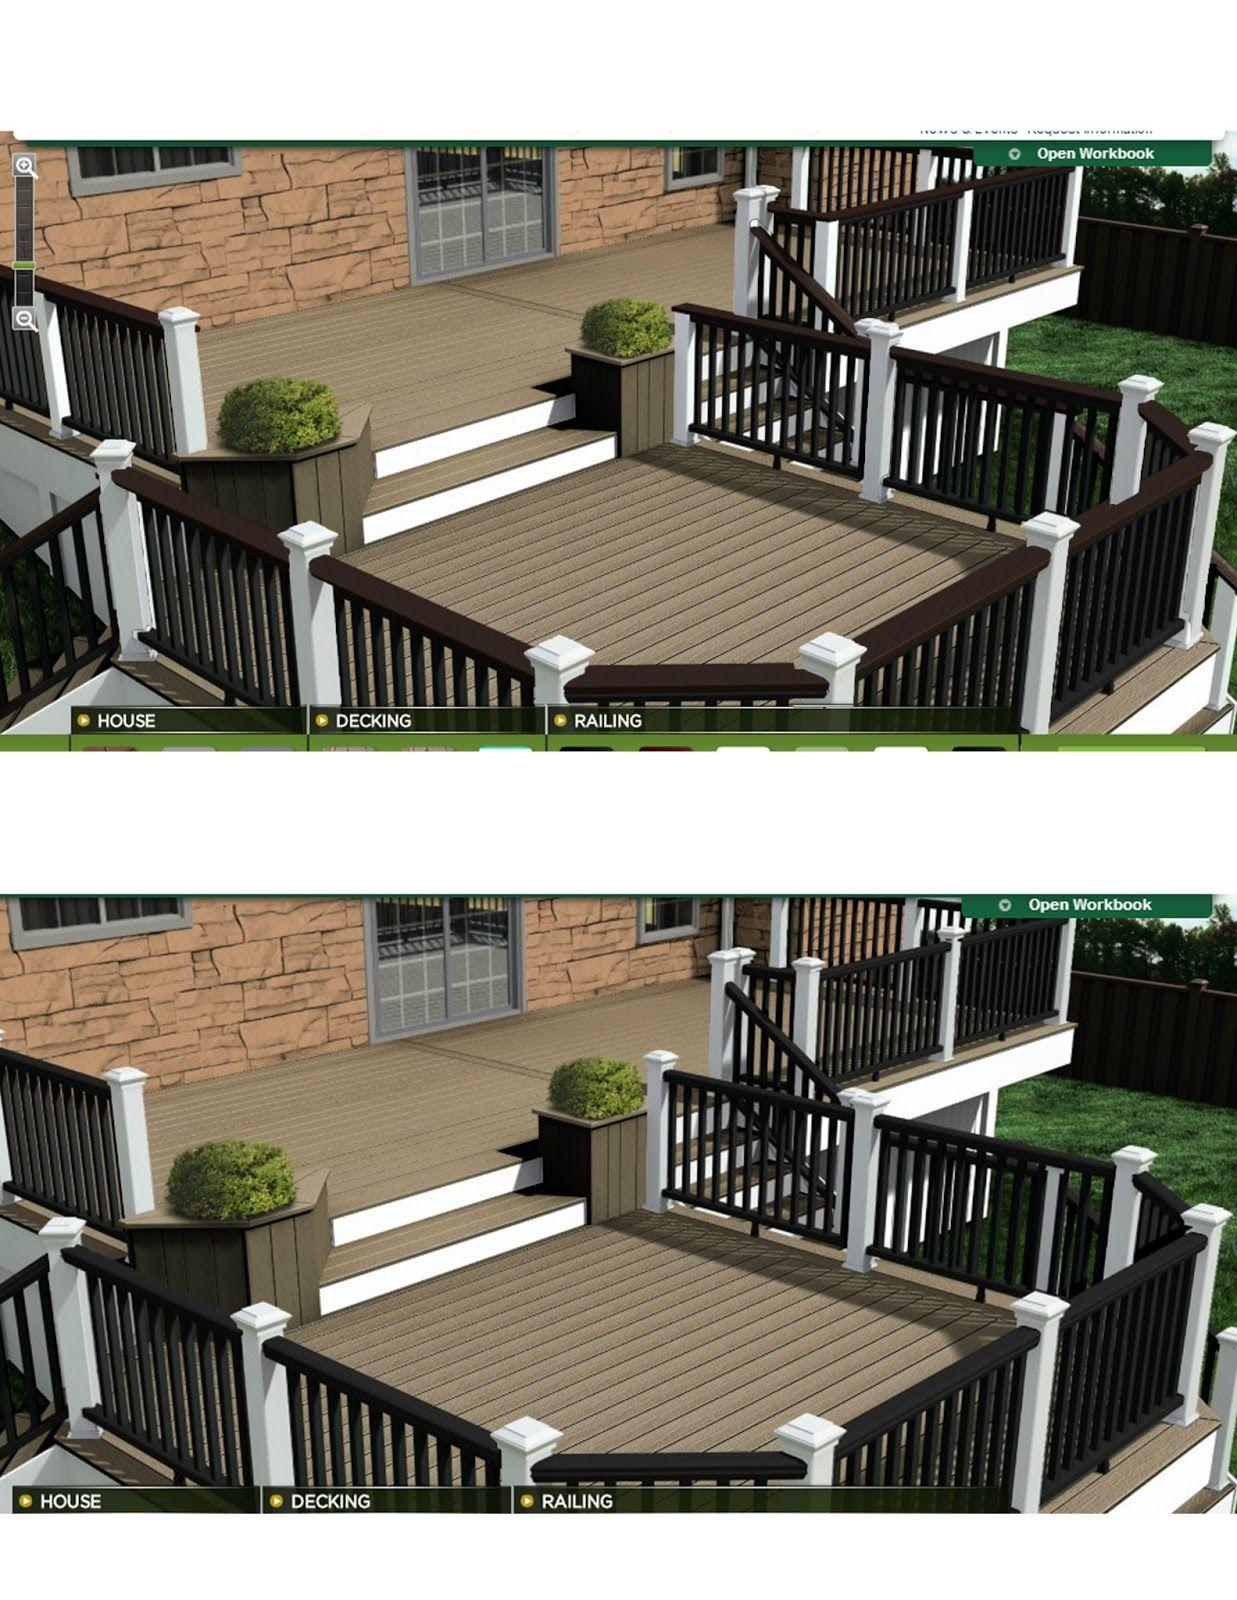 Deck Stain 2 Colors Outdoor Decor Pinterest